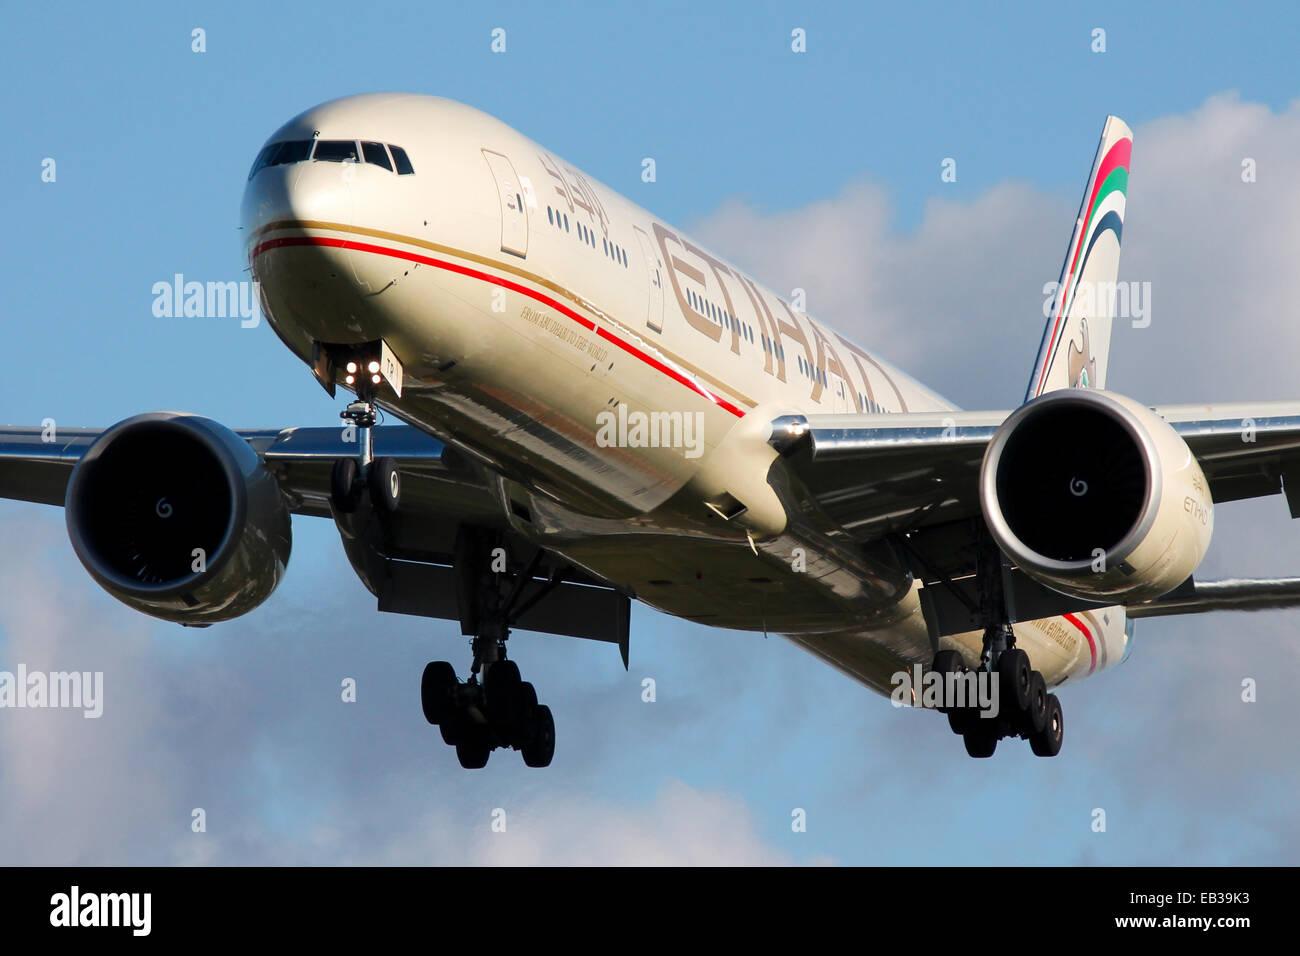 Etihad Airways Boeing 777-300 approaches runway 27L at London Heathrow airport. - Stock Image